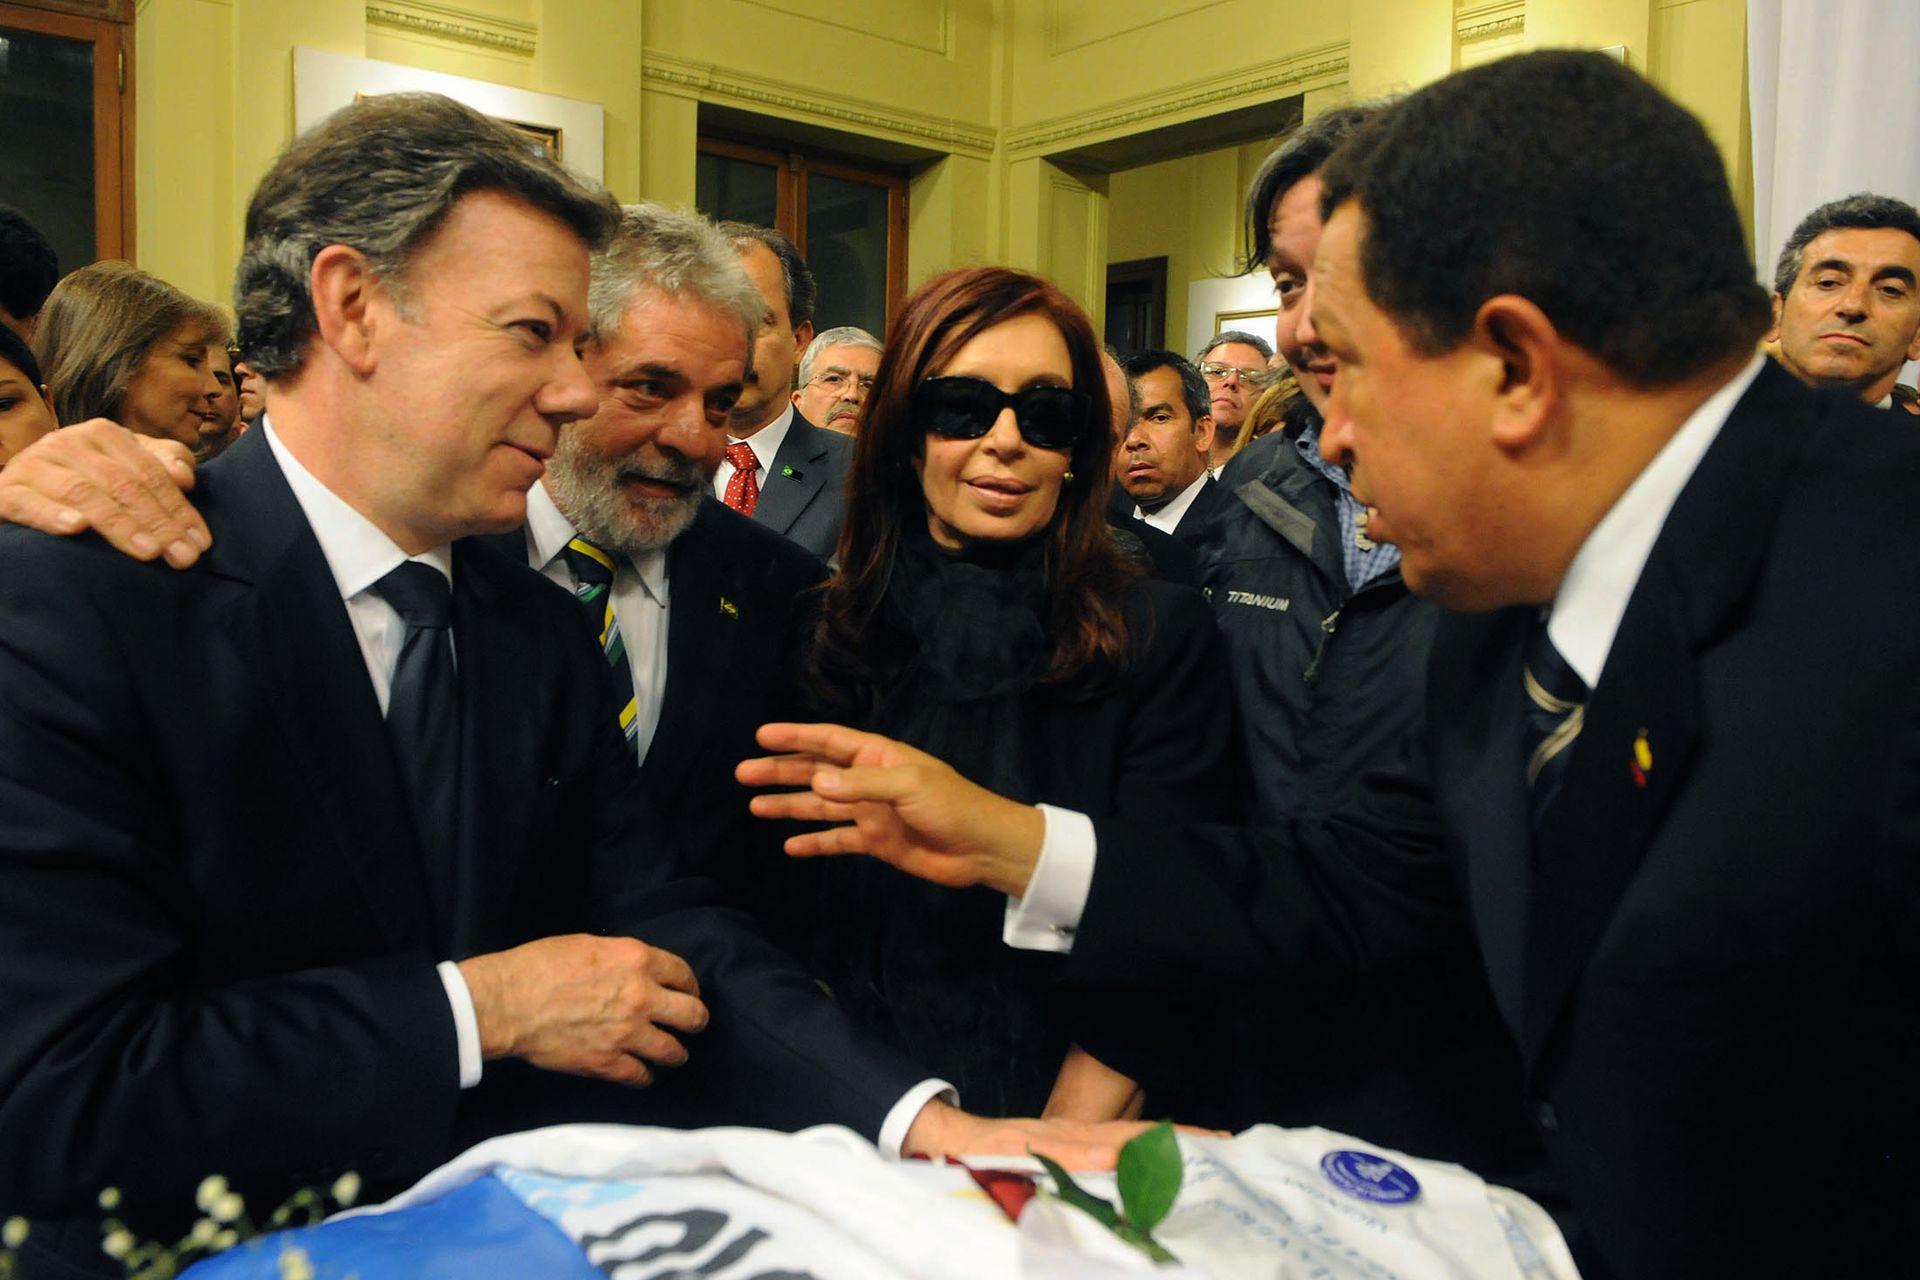 Juan Manuel Santos, Lula Da Silva y Hugo Chávez, junto a Cristina Kirchner, durante el velatorio de Néstor Kirchner